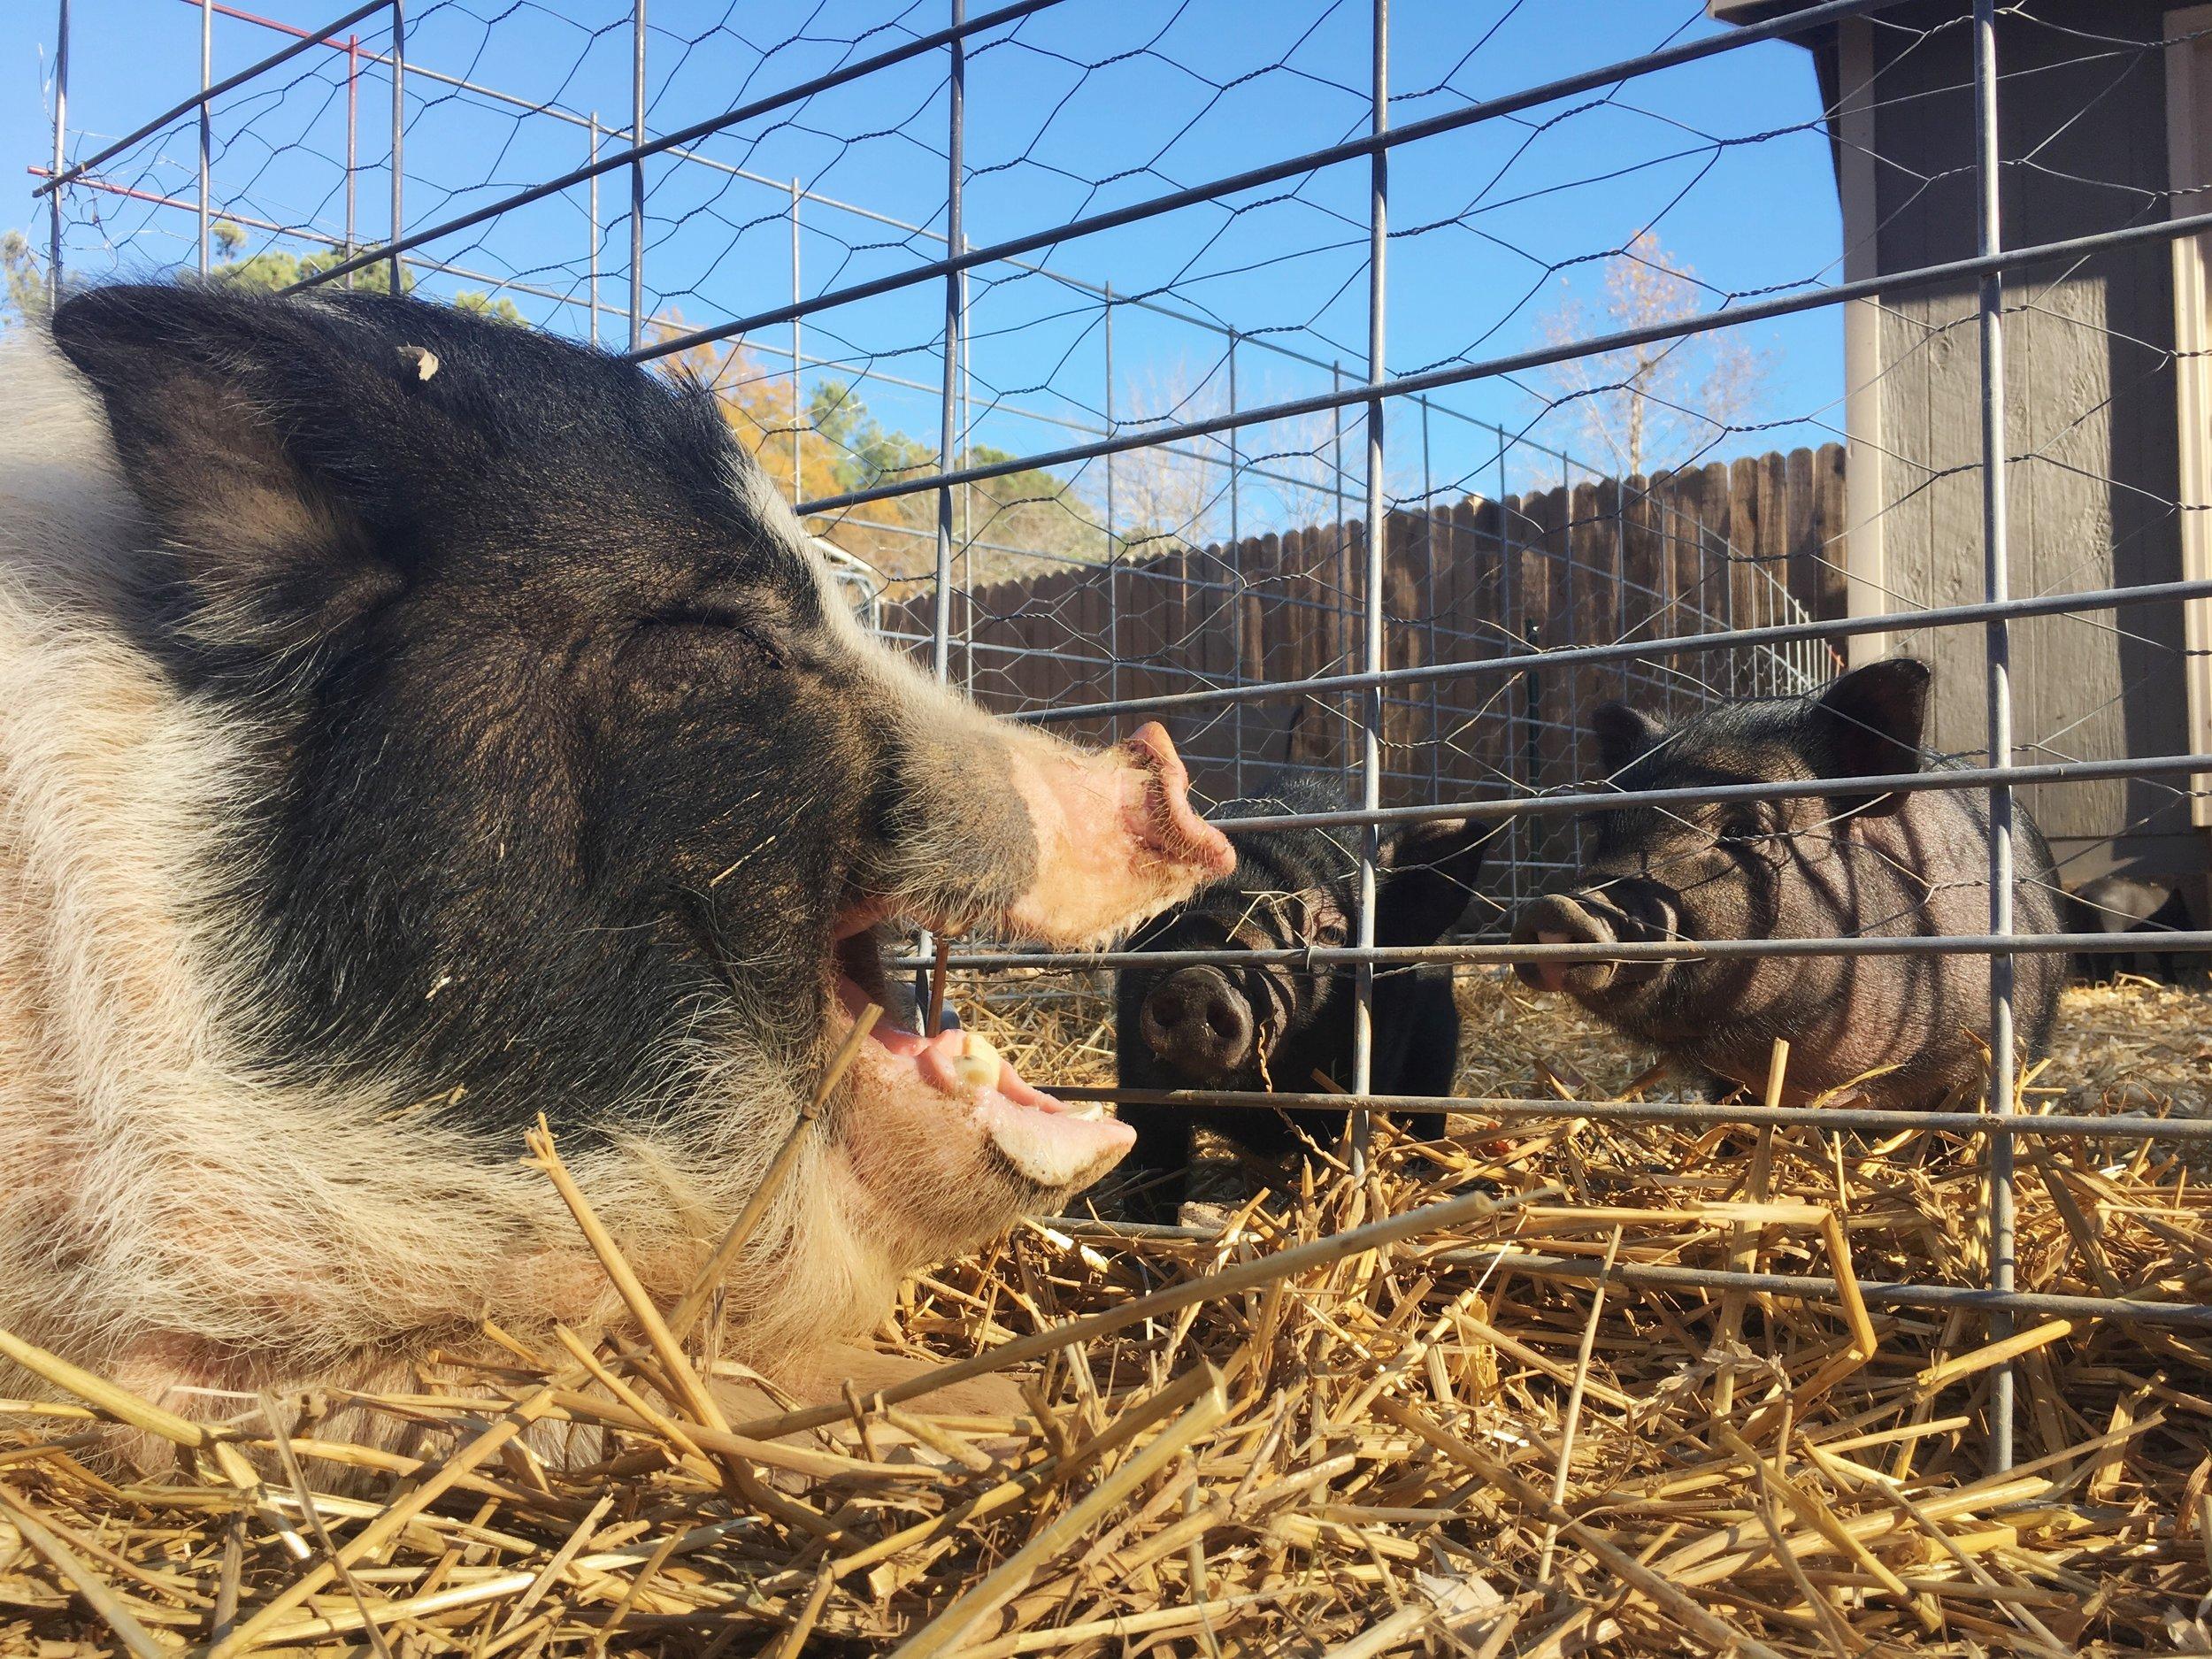 Sebastian with piglets